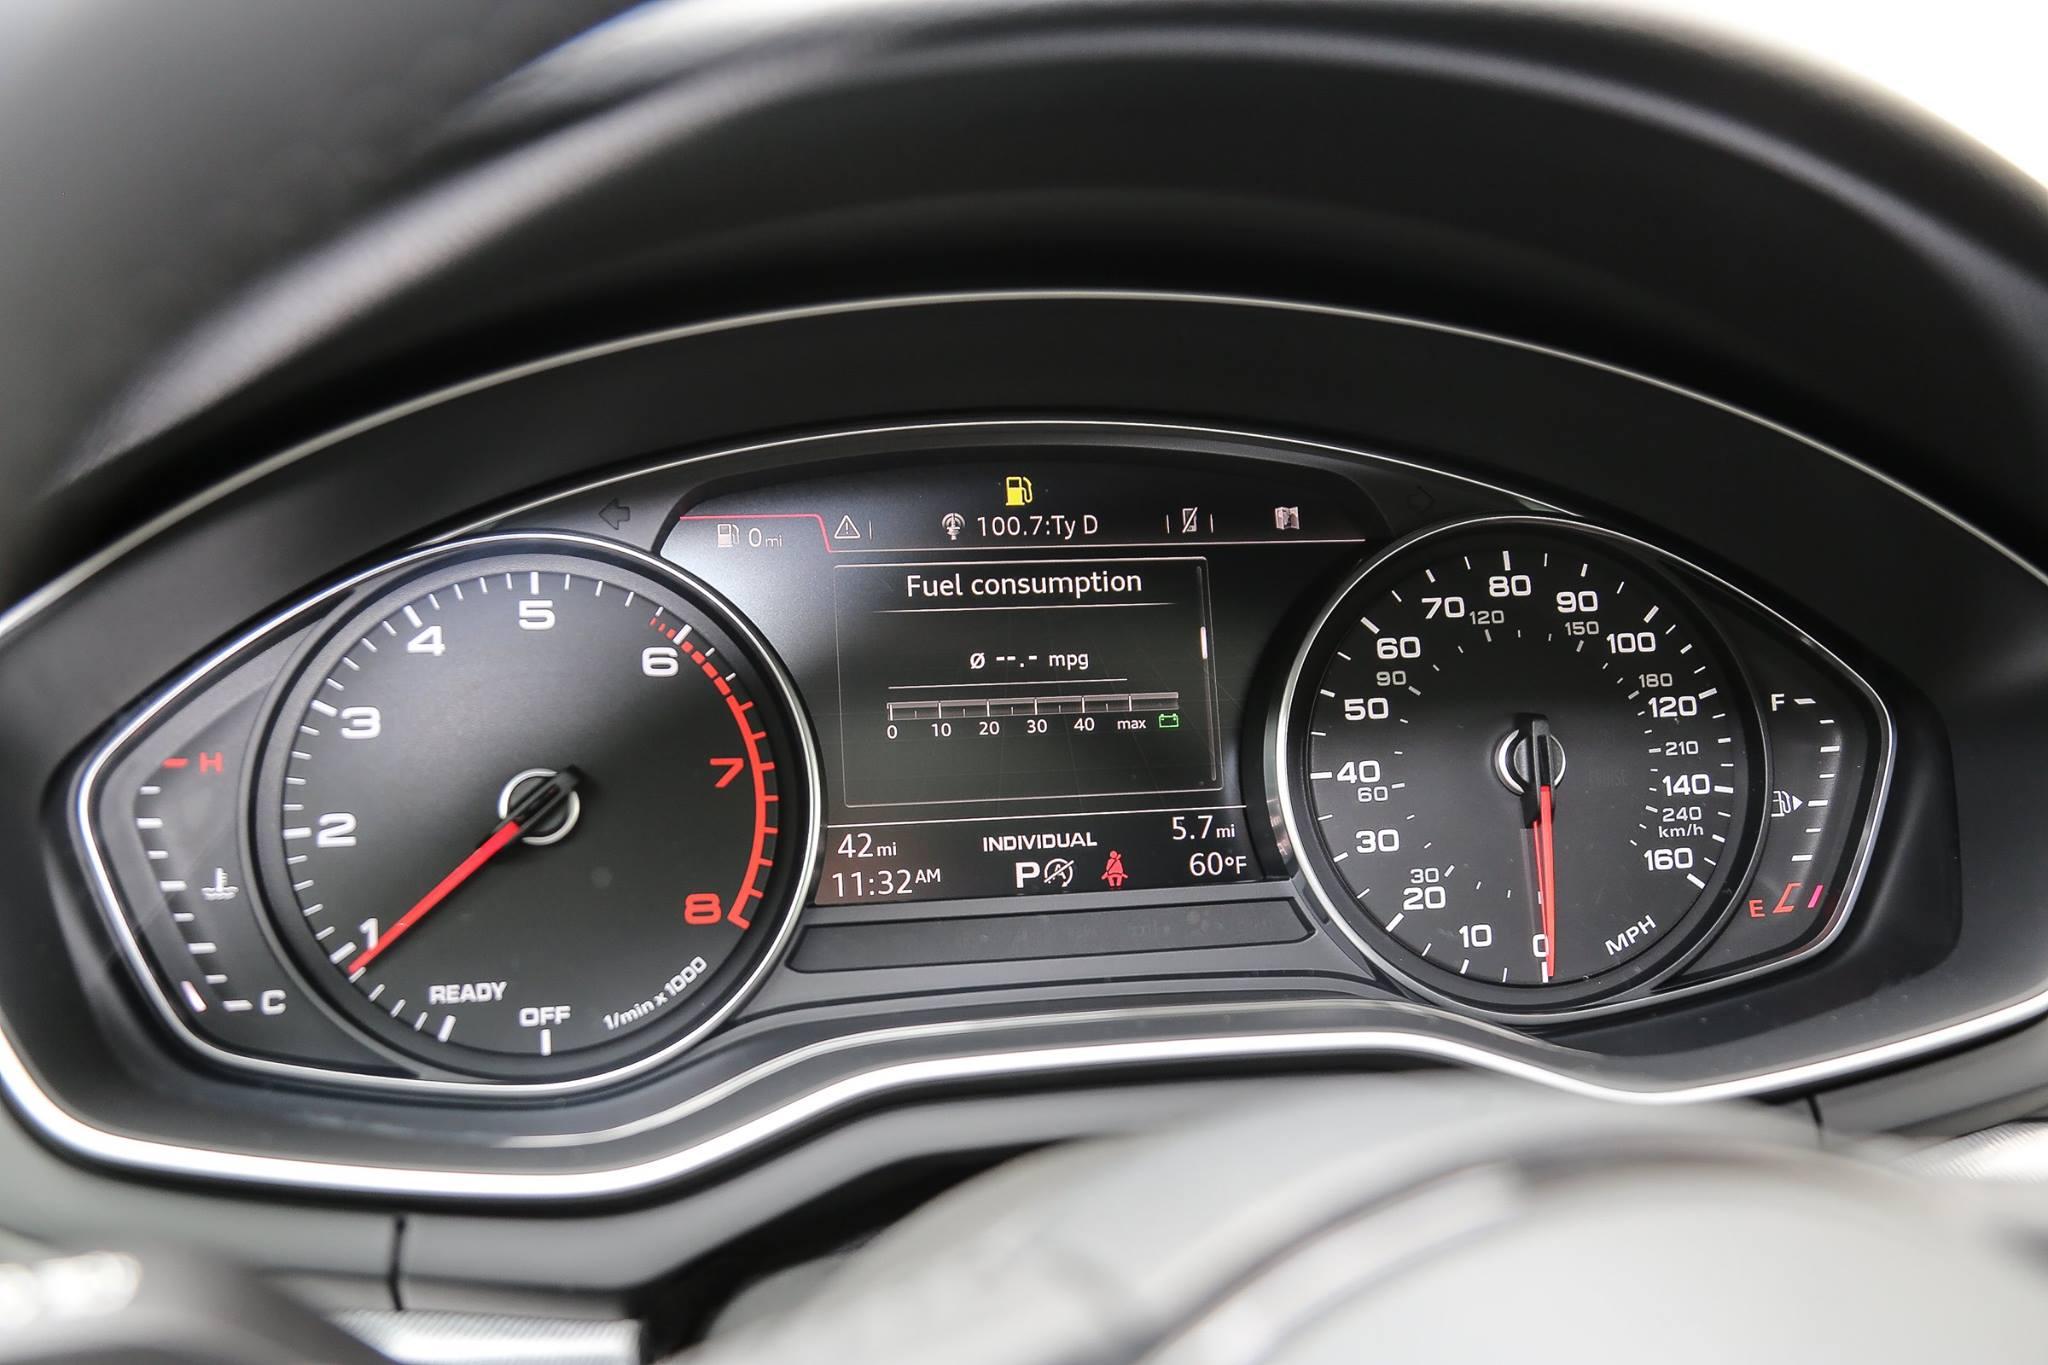 Audi A With Standard Xenon Headlights Looks Boring Autoevolution - 2018 audi a4 headlights